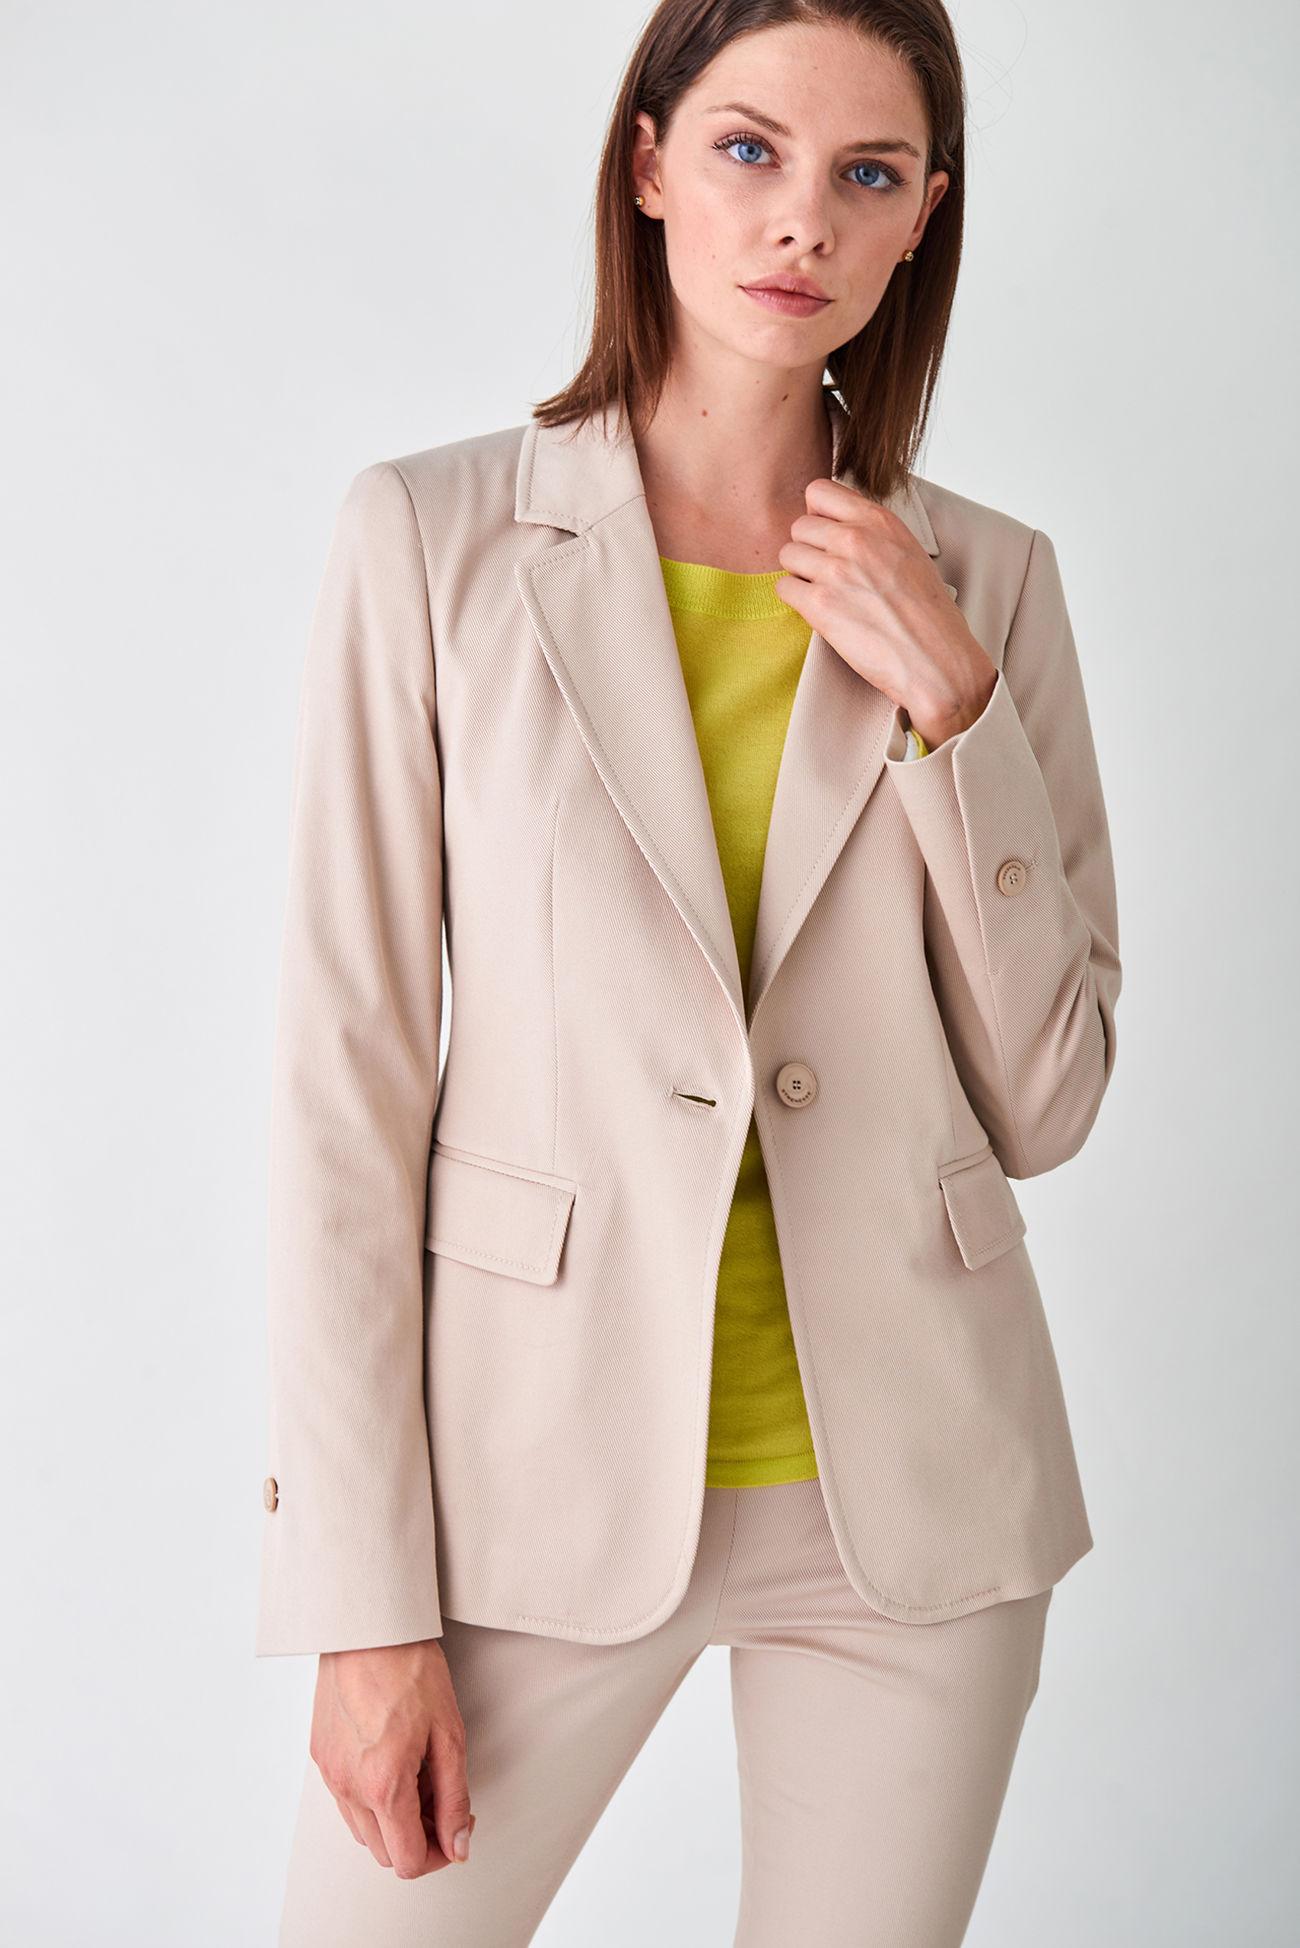 Sportive tailored blazer made of stretch garbadine